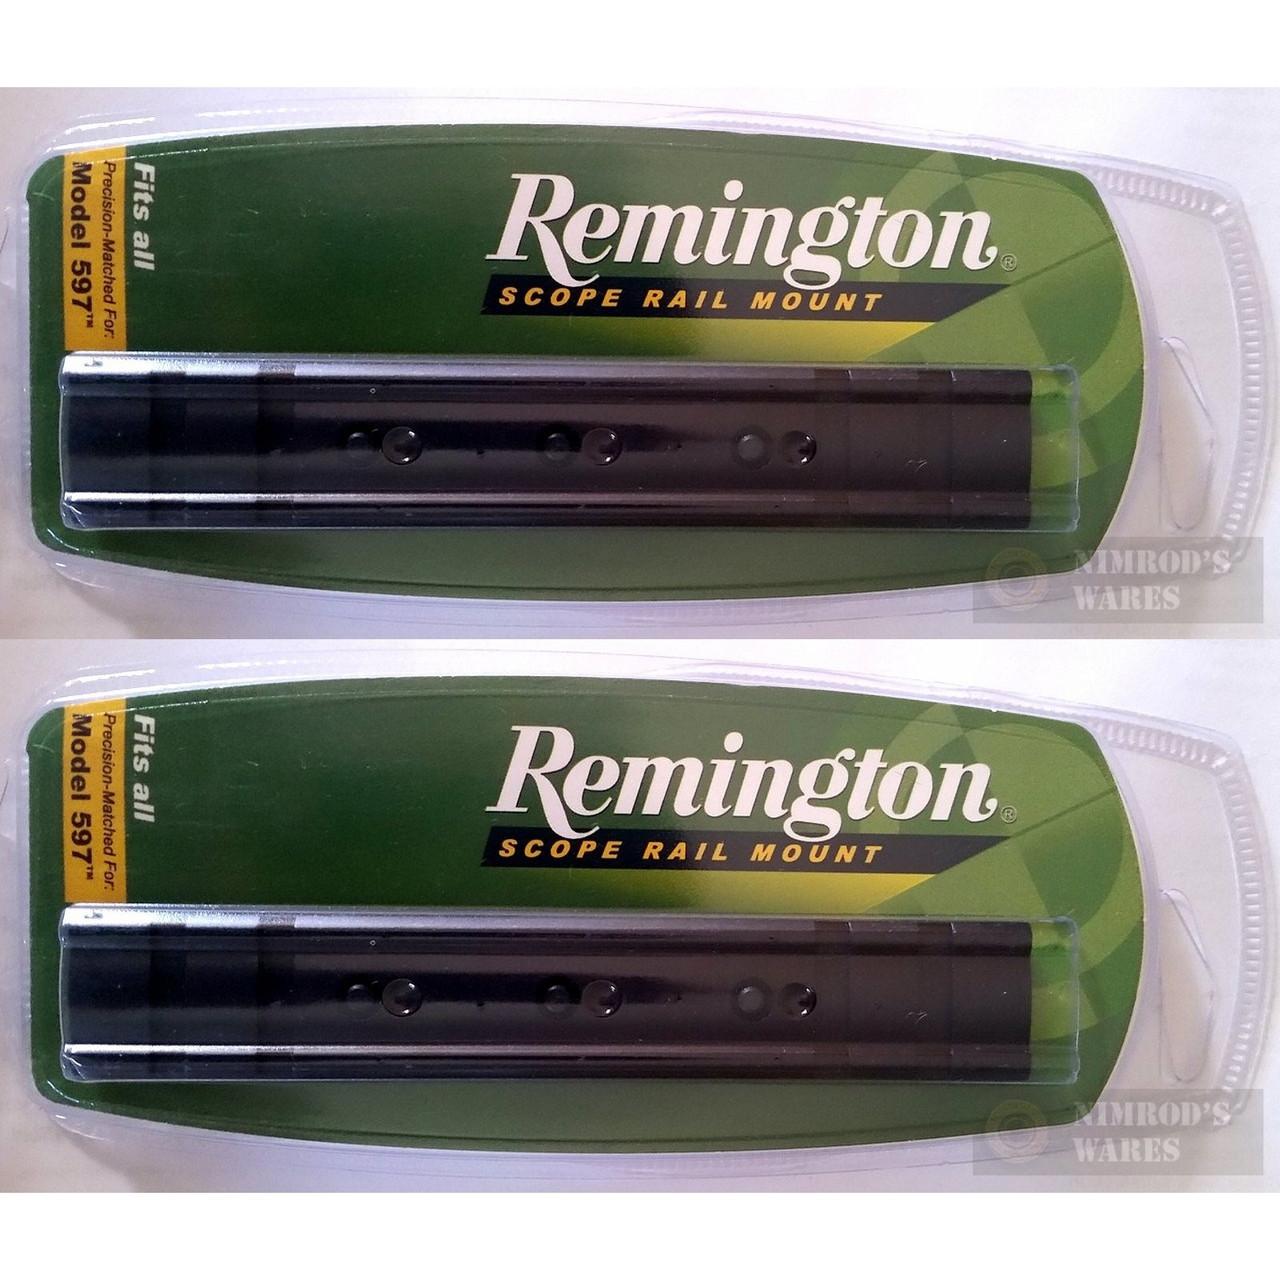 "Remington 597 Rifle 1/"" Scope Mount Rail Black-18635"